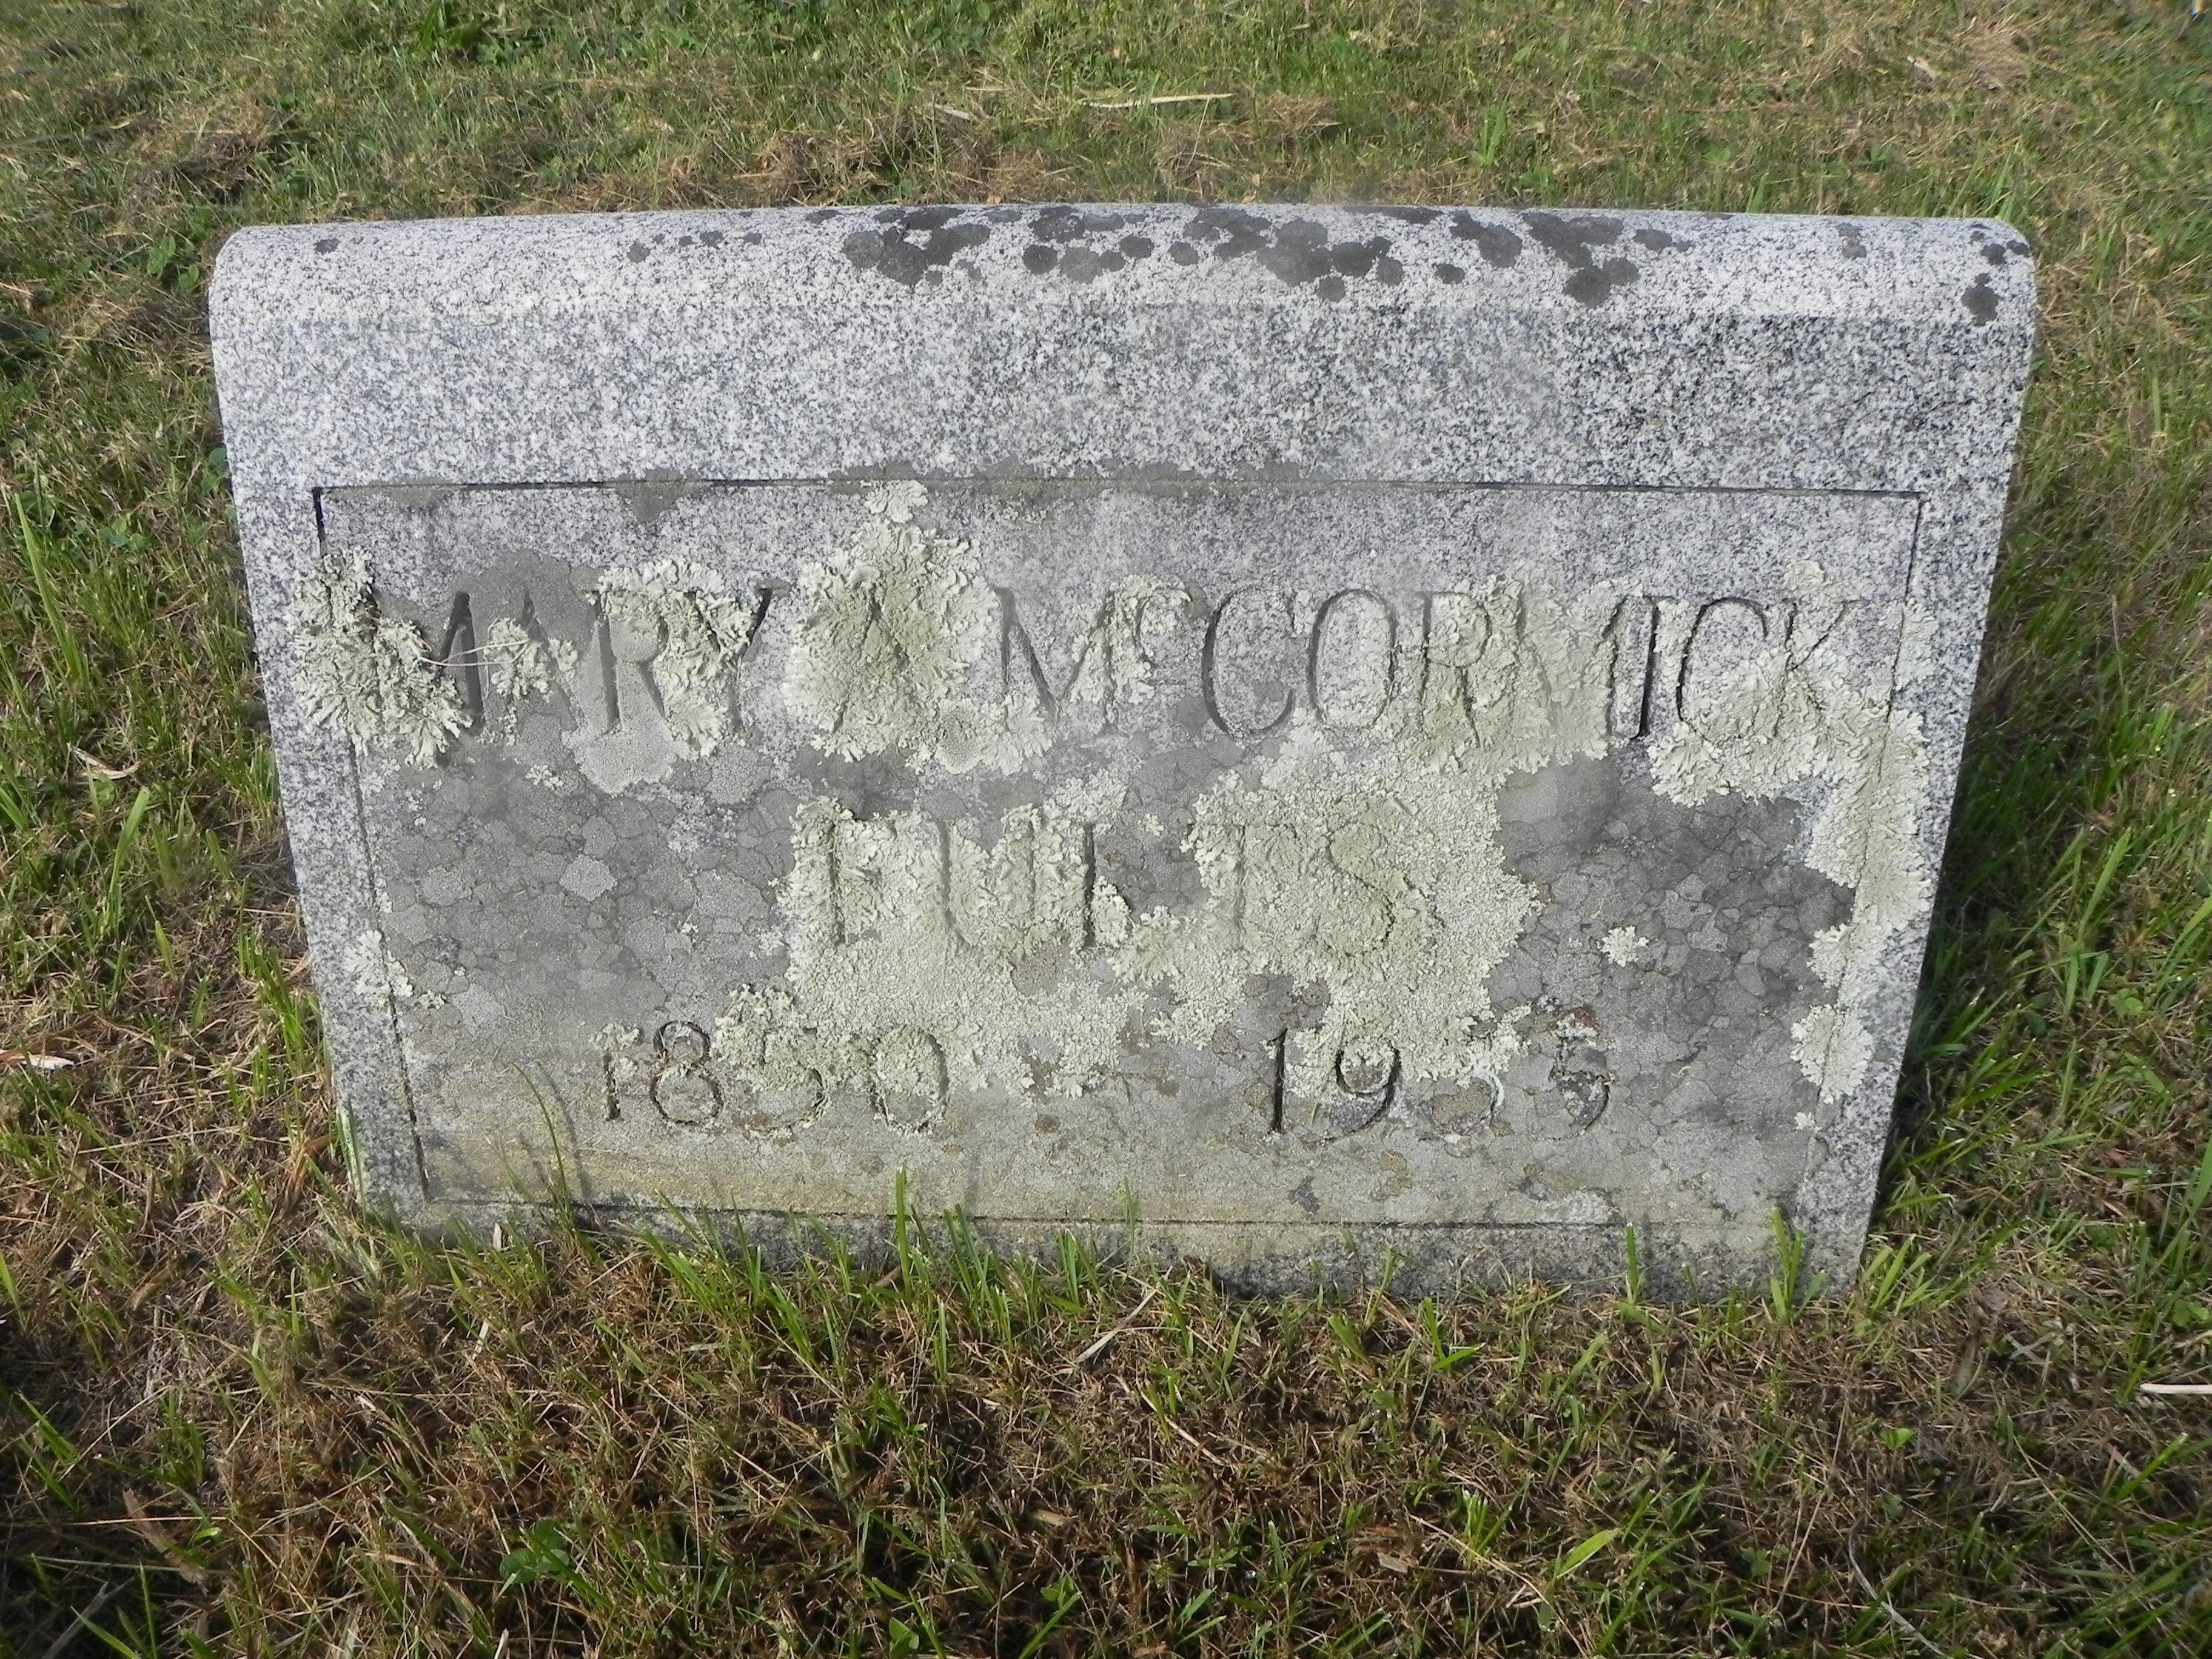 Ann McCormick